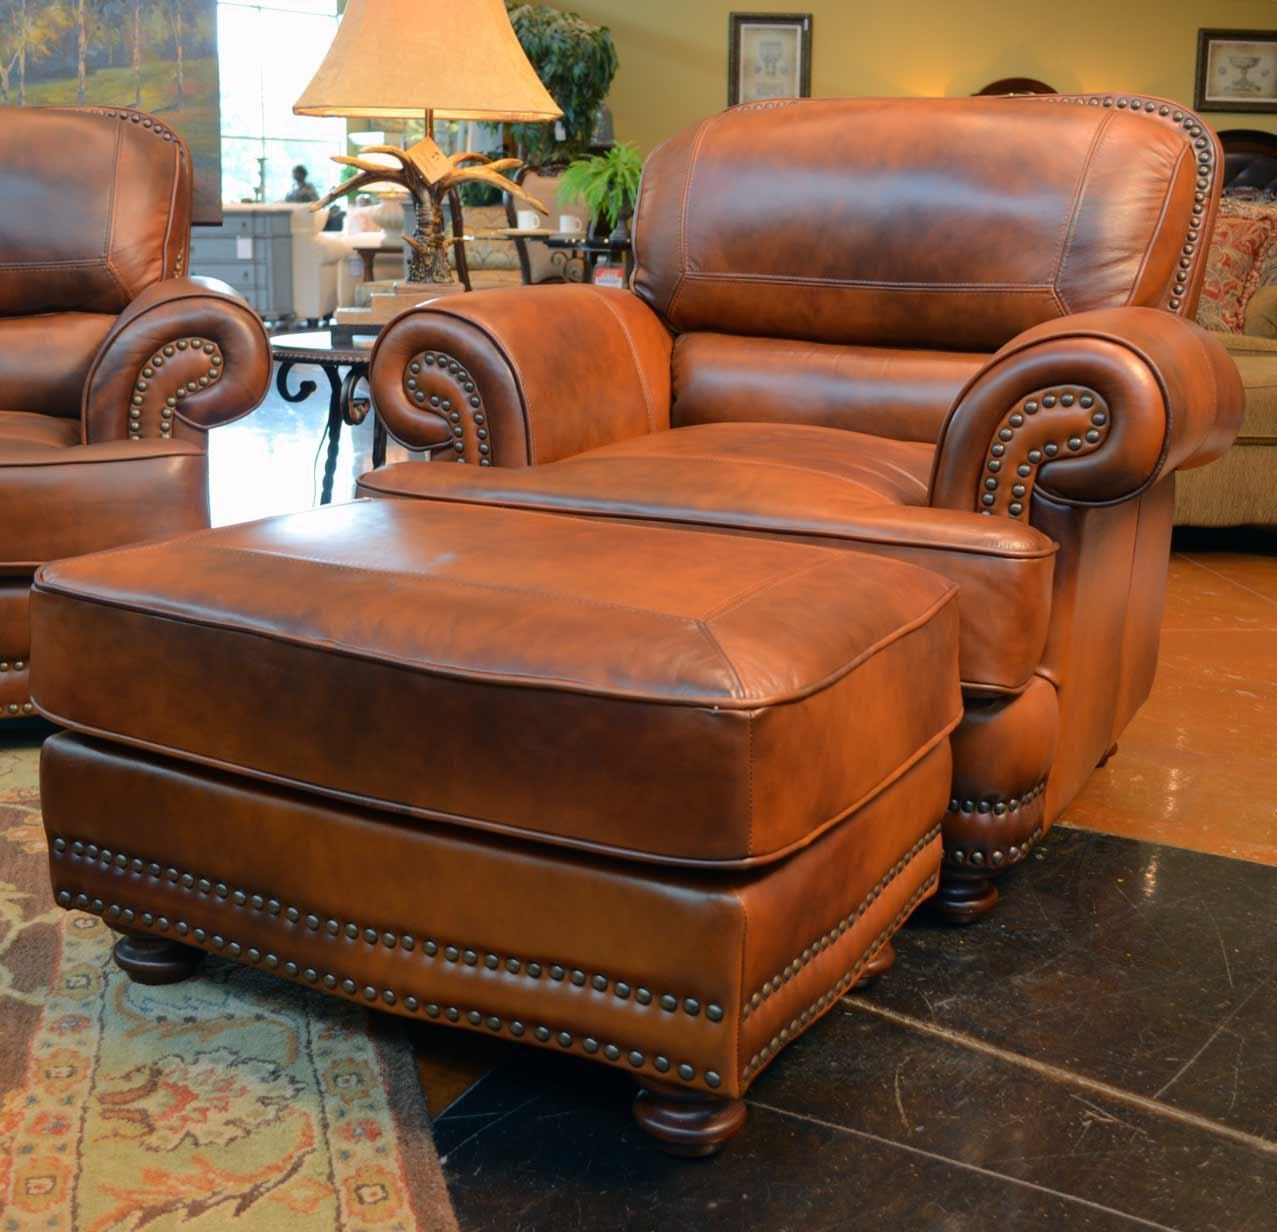 Incroyable LG Interiors CowboyLeather Chair; LG Interiors CowboyLeather Chair